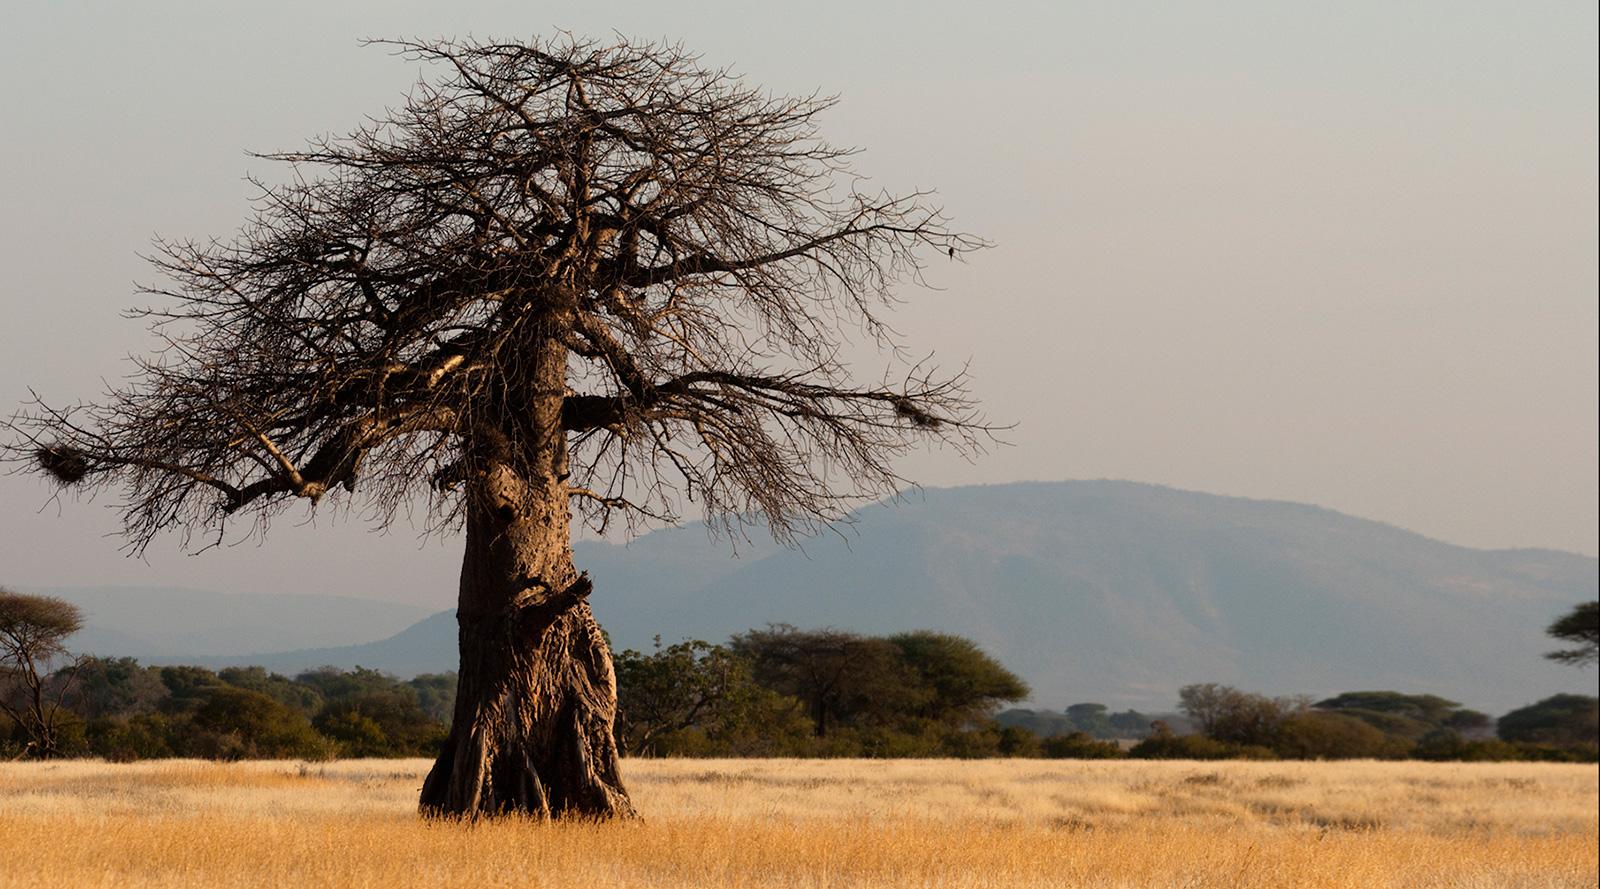 © Pietro Luraschi | Ruaha National Park, Tanzania